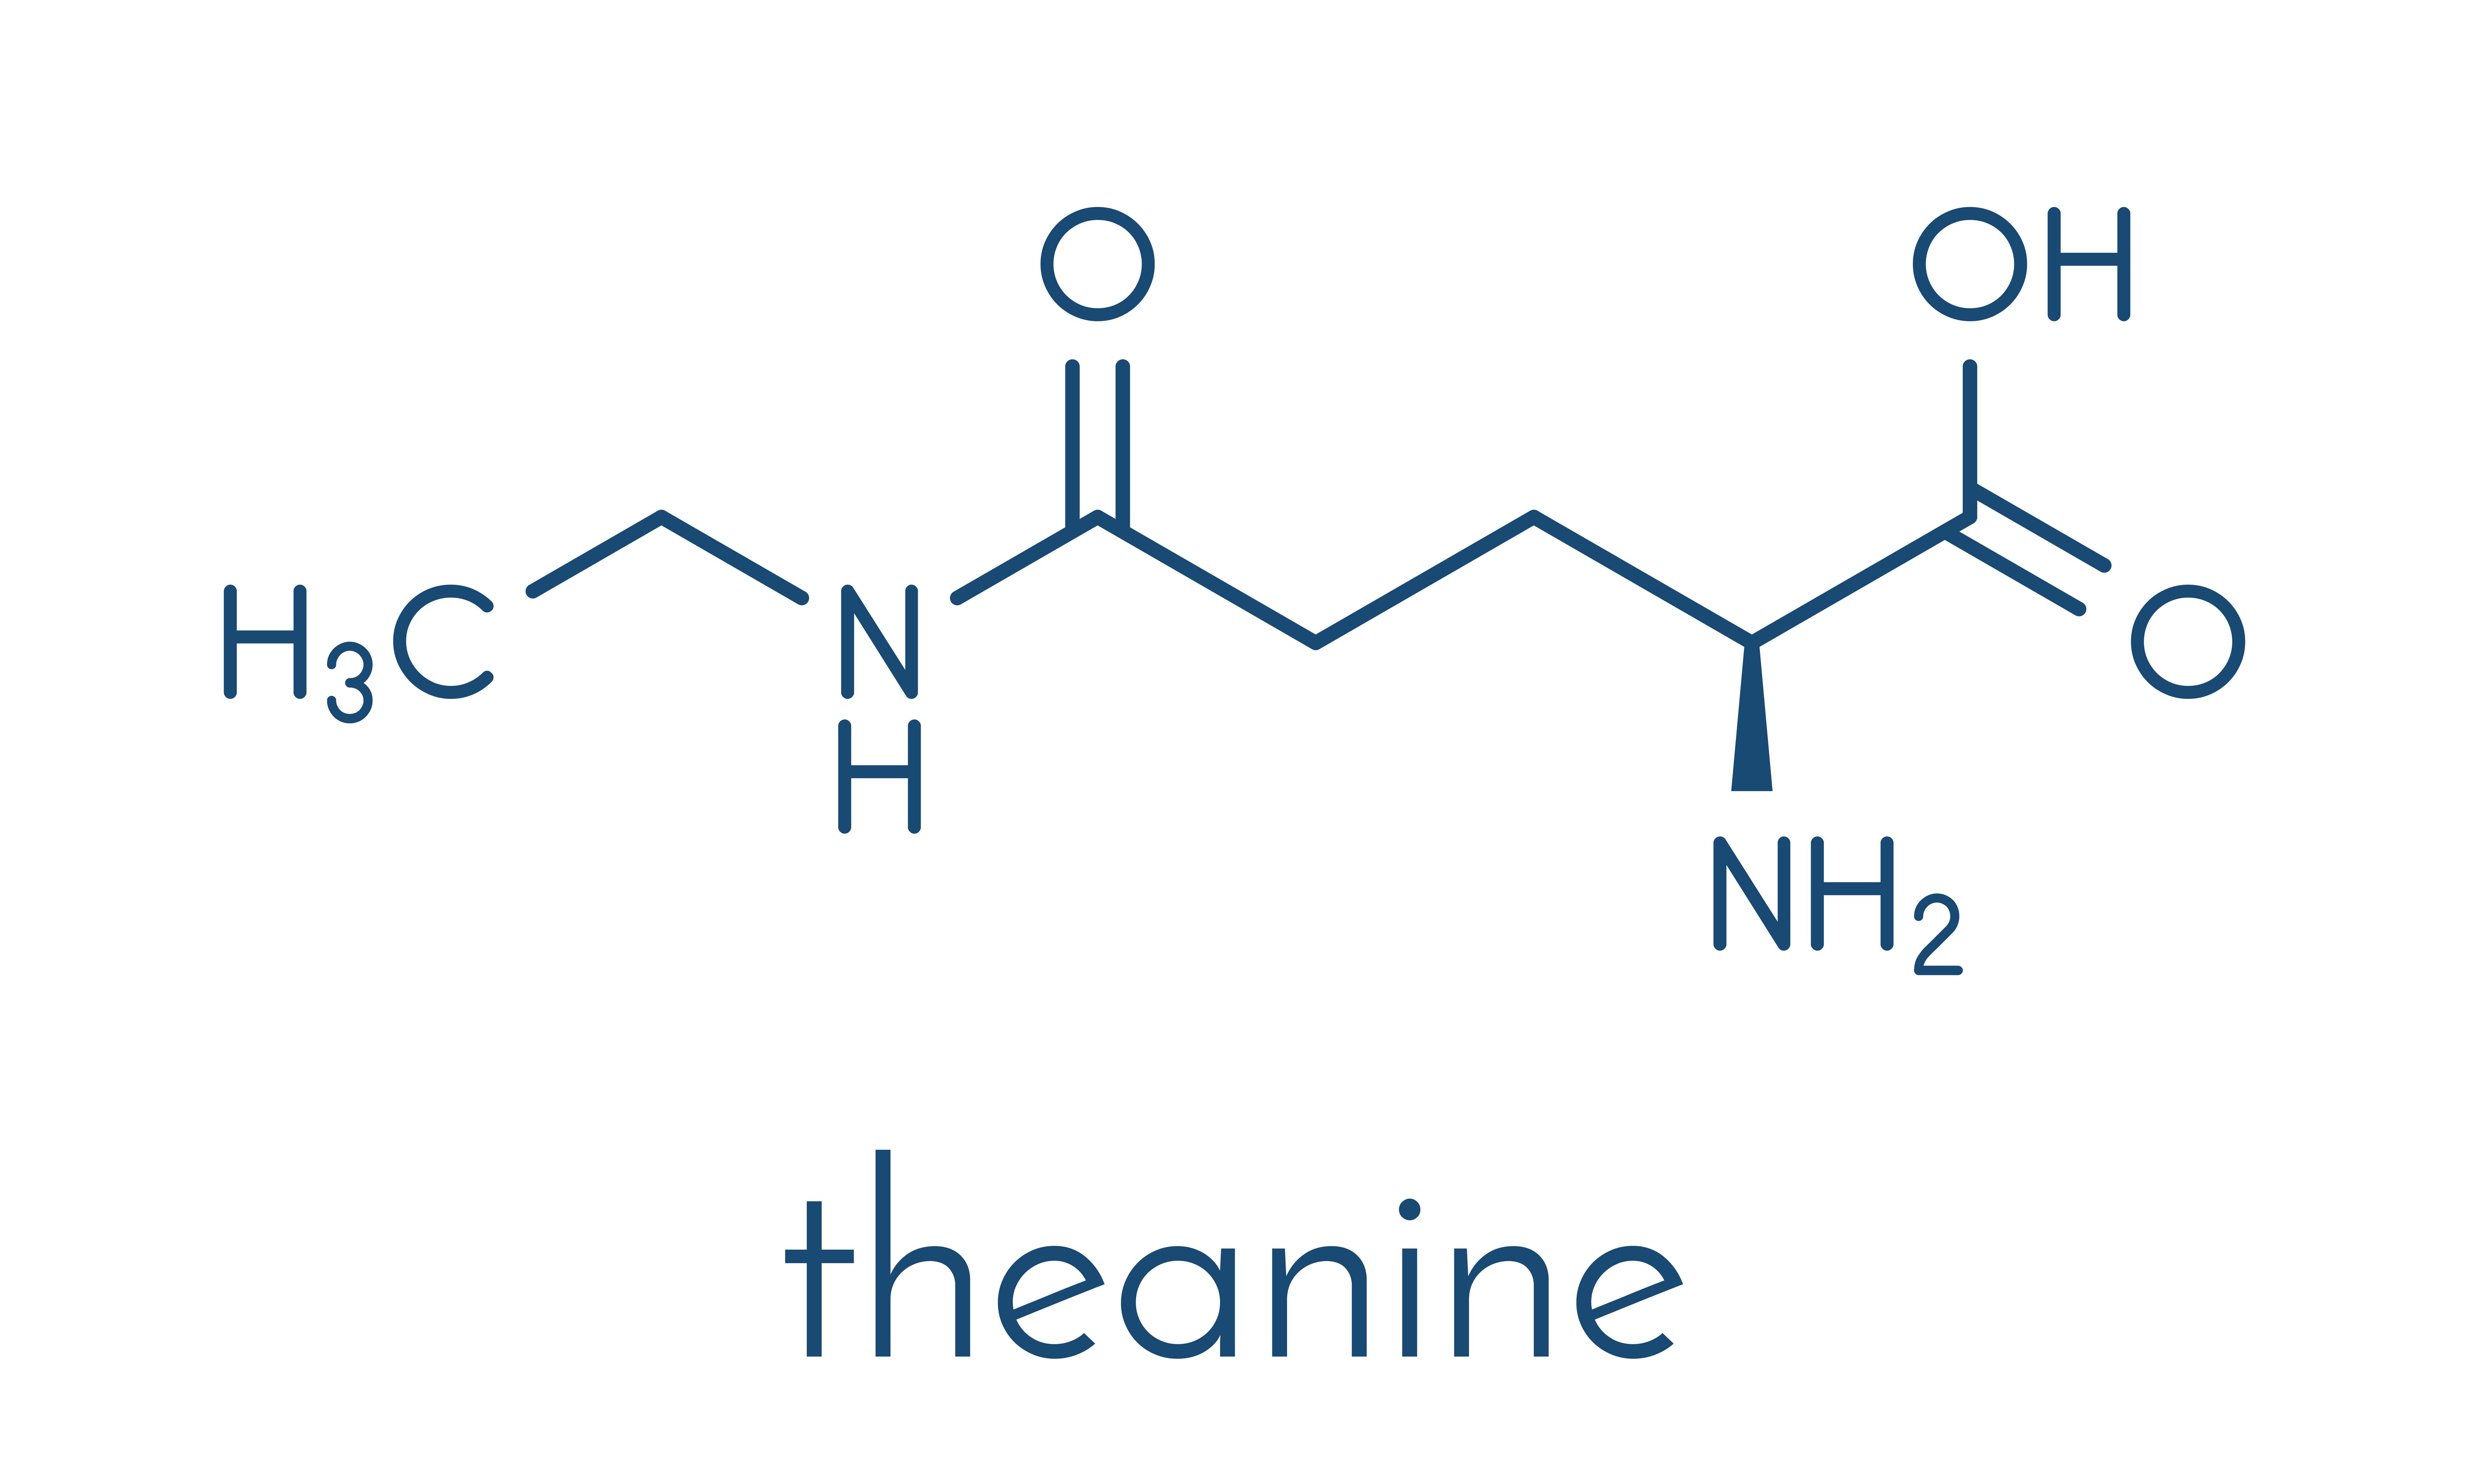 Theanine - chemical formula